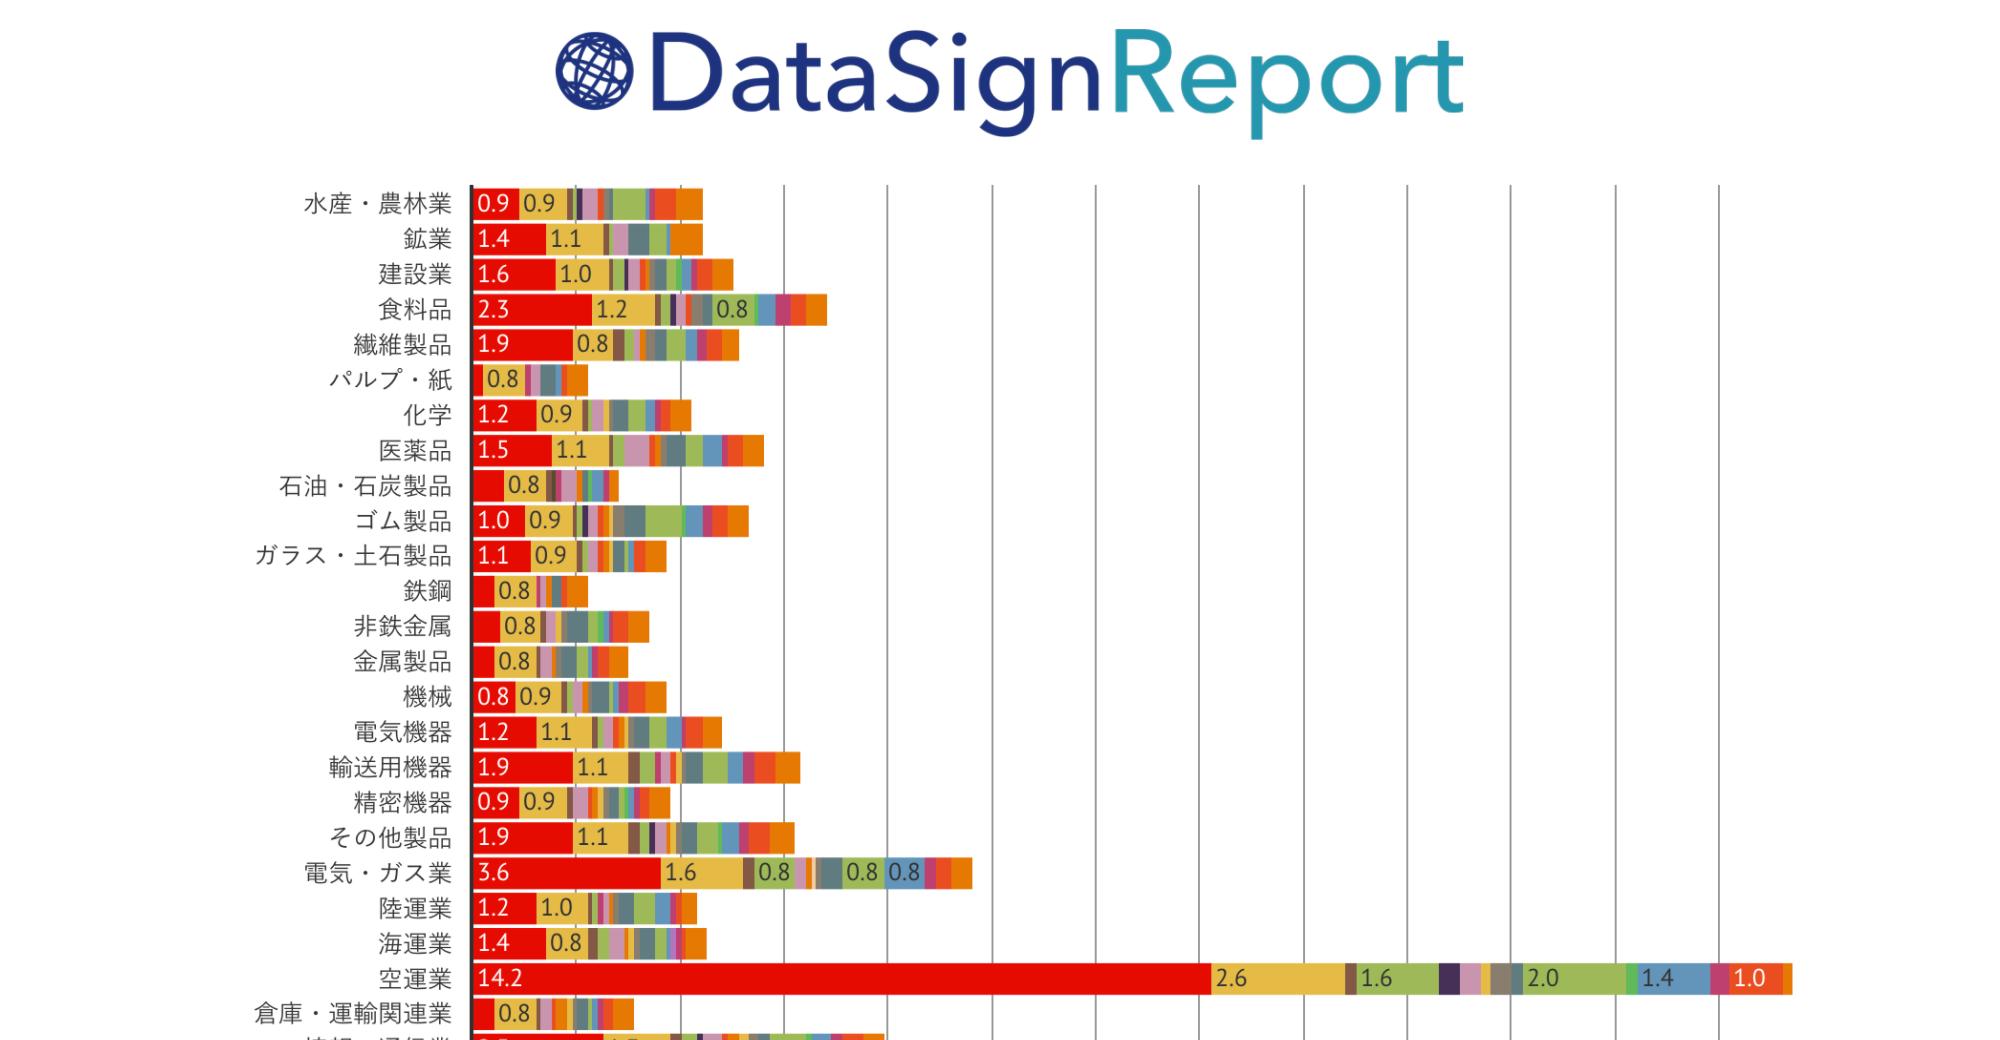 DataSign Report 上場企業調査 2017.10